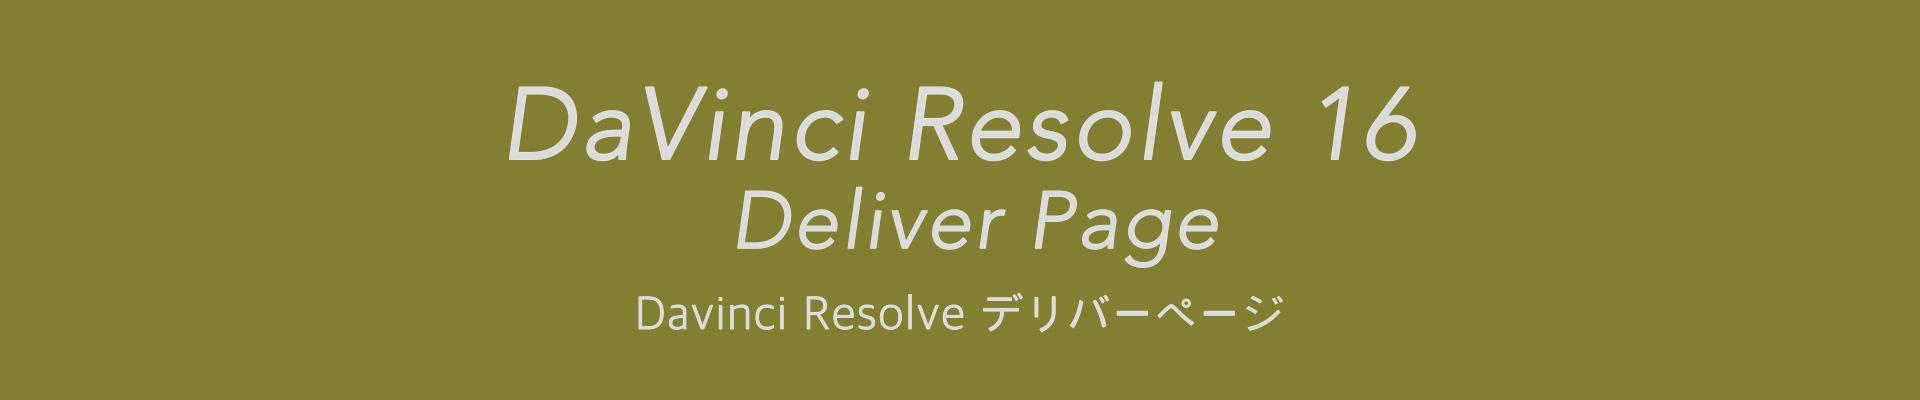 DaVinci Resolve 16 デリバー ページ